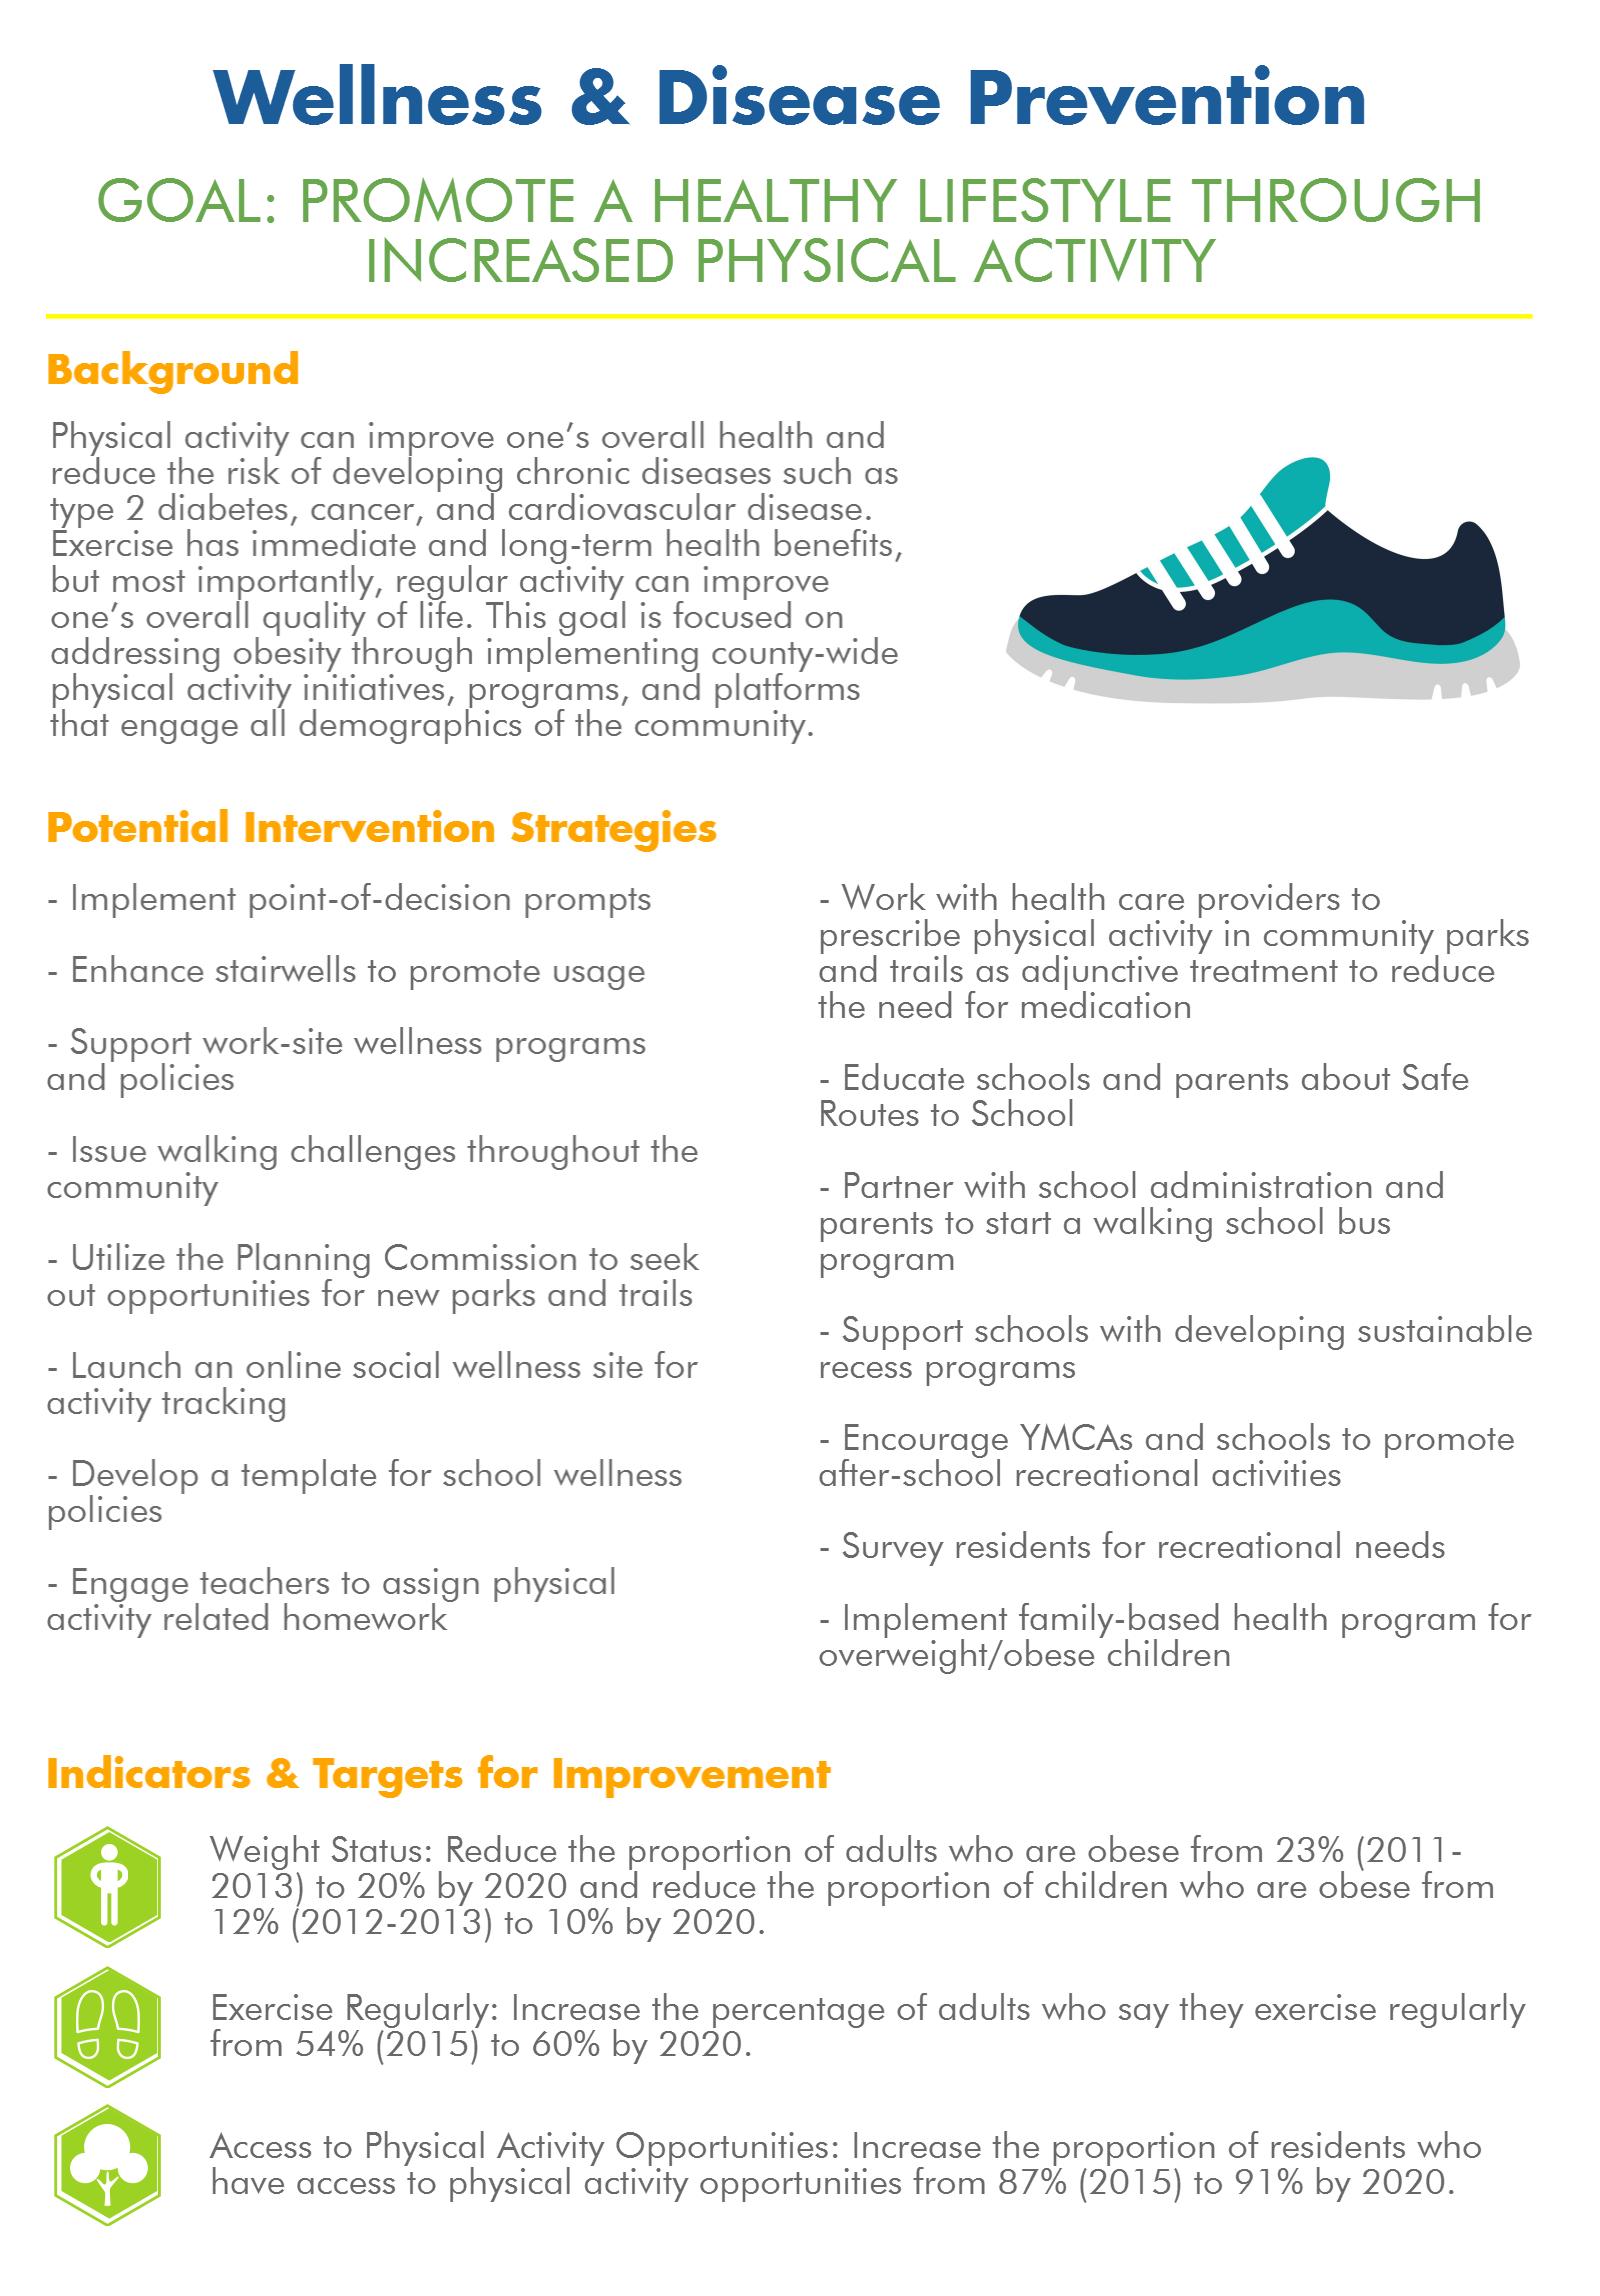 Wellness&Disease Prevention Image